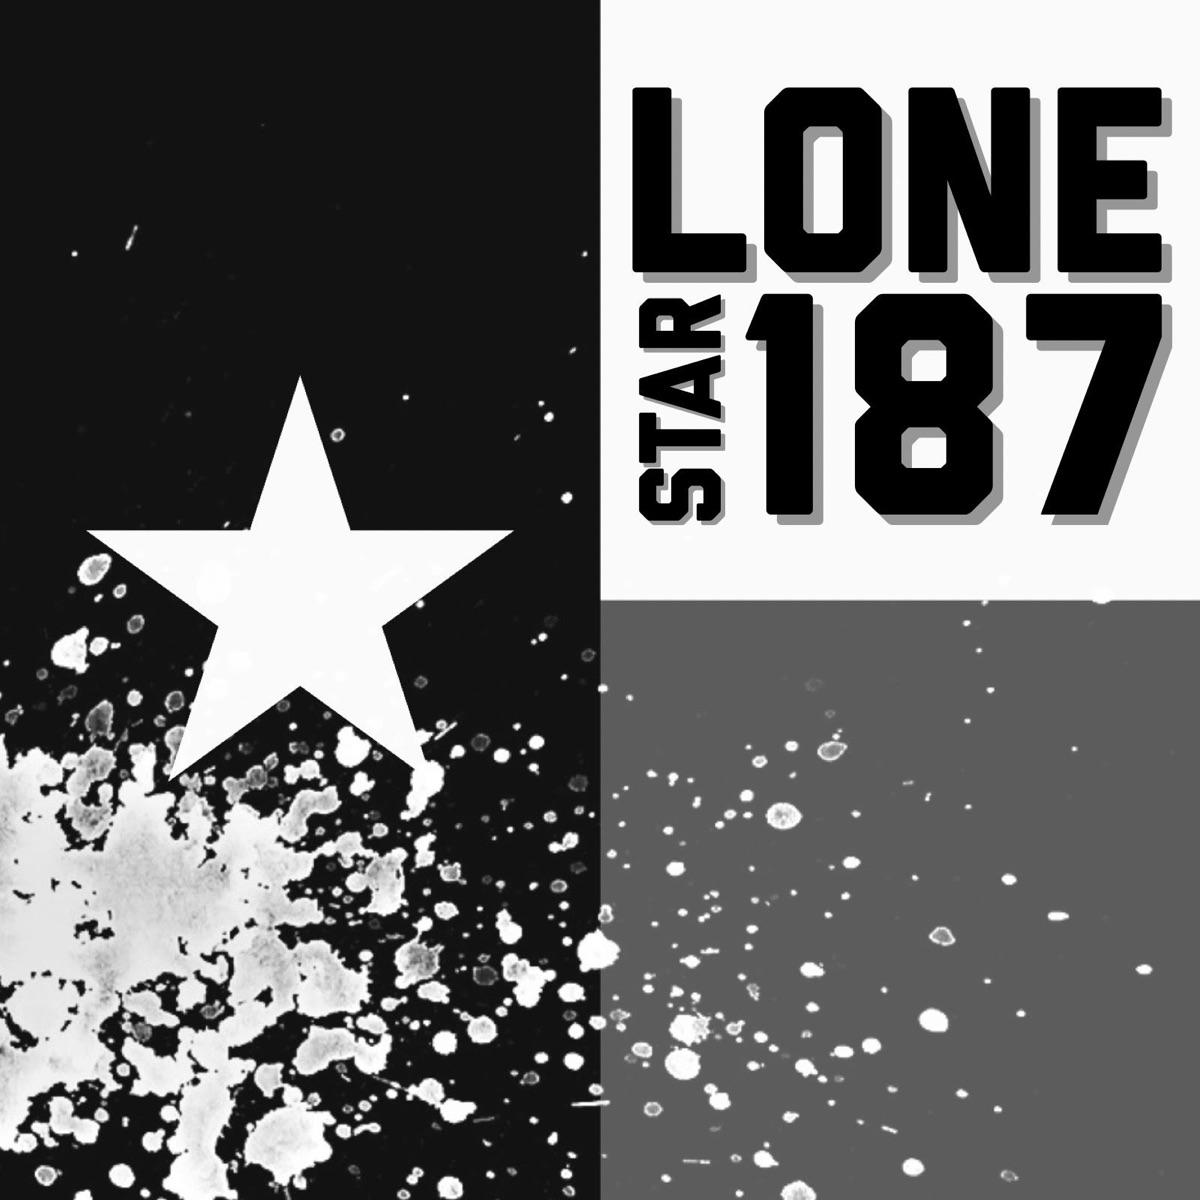 The lonestar187's Podcast